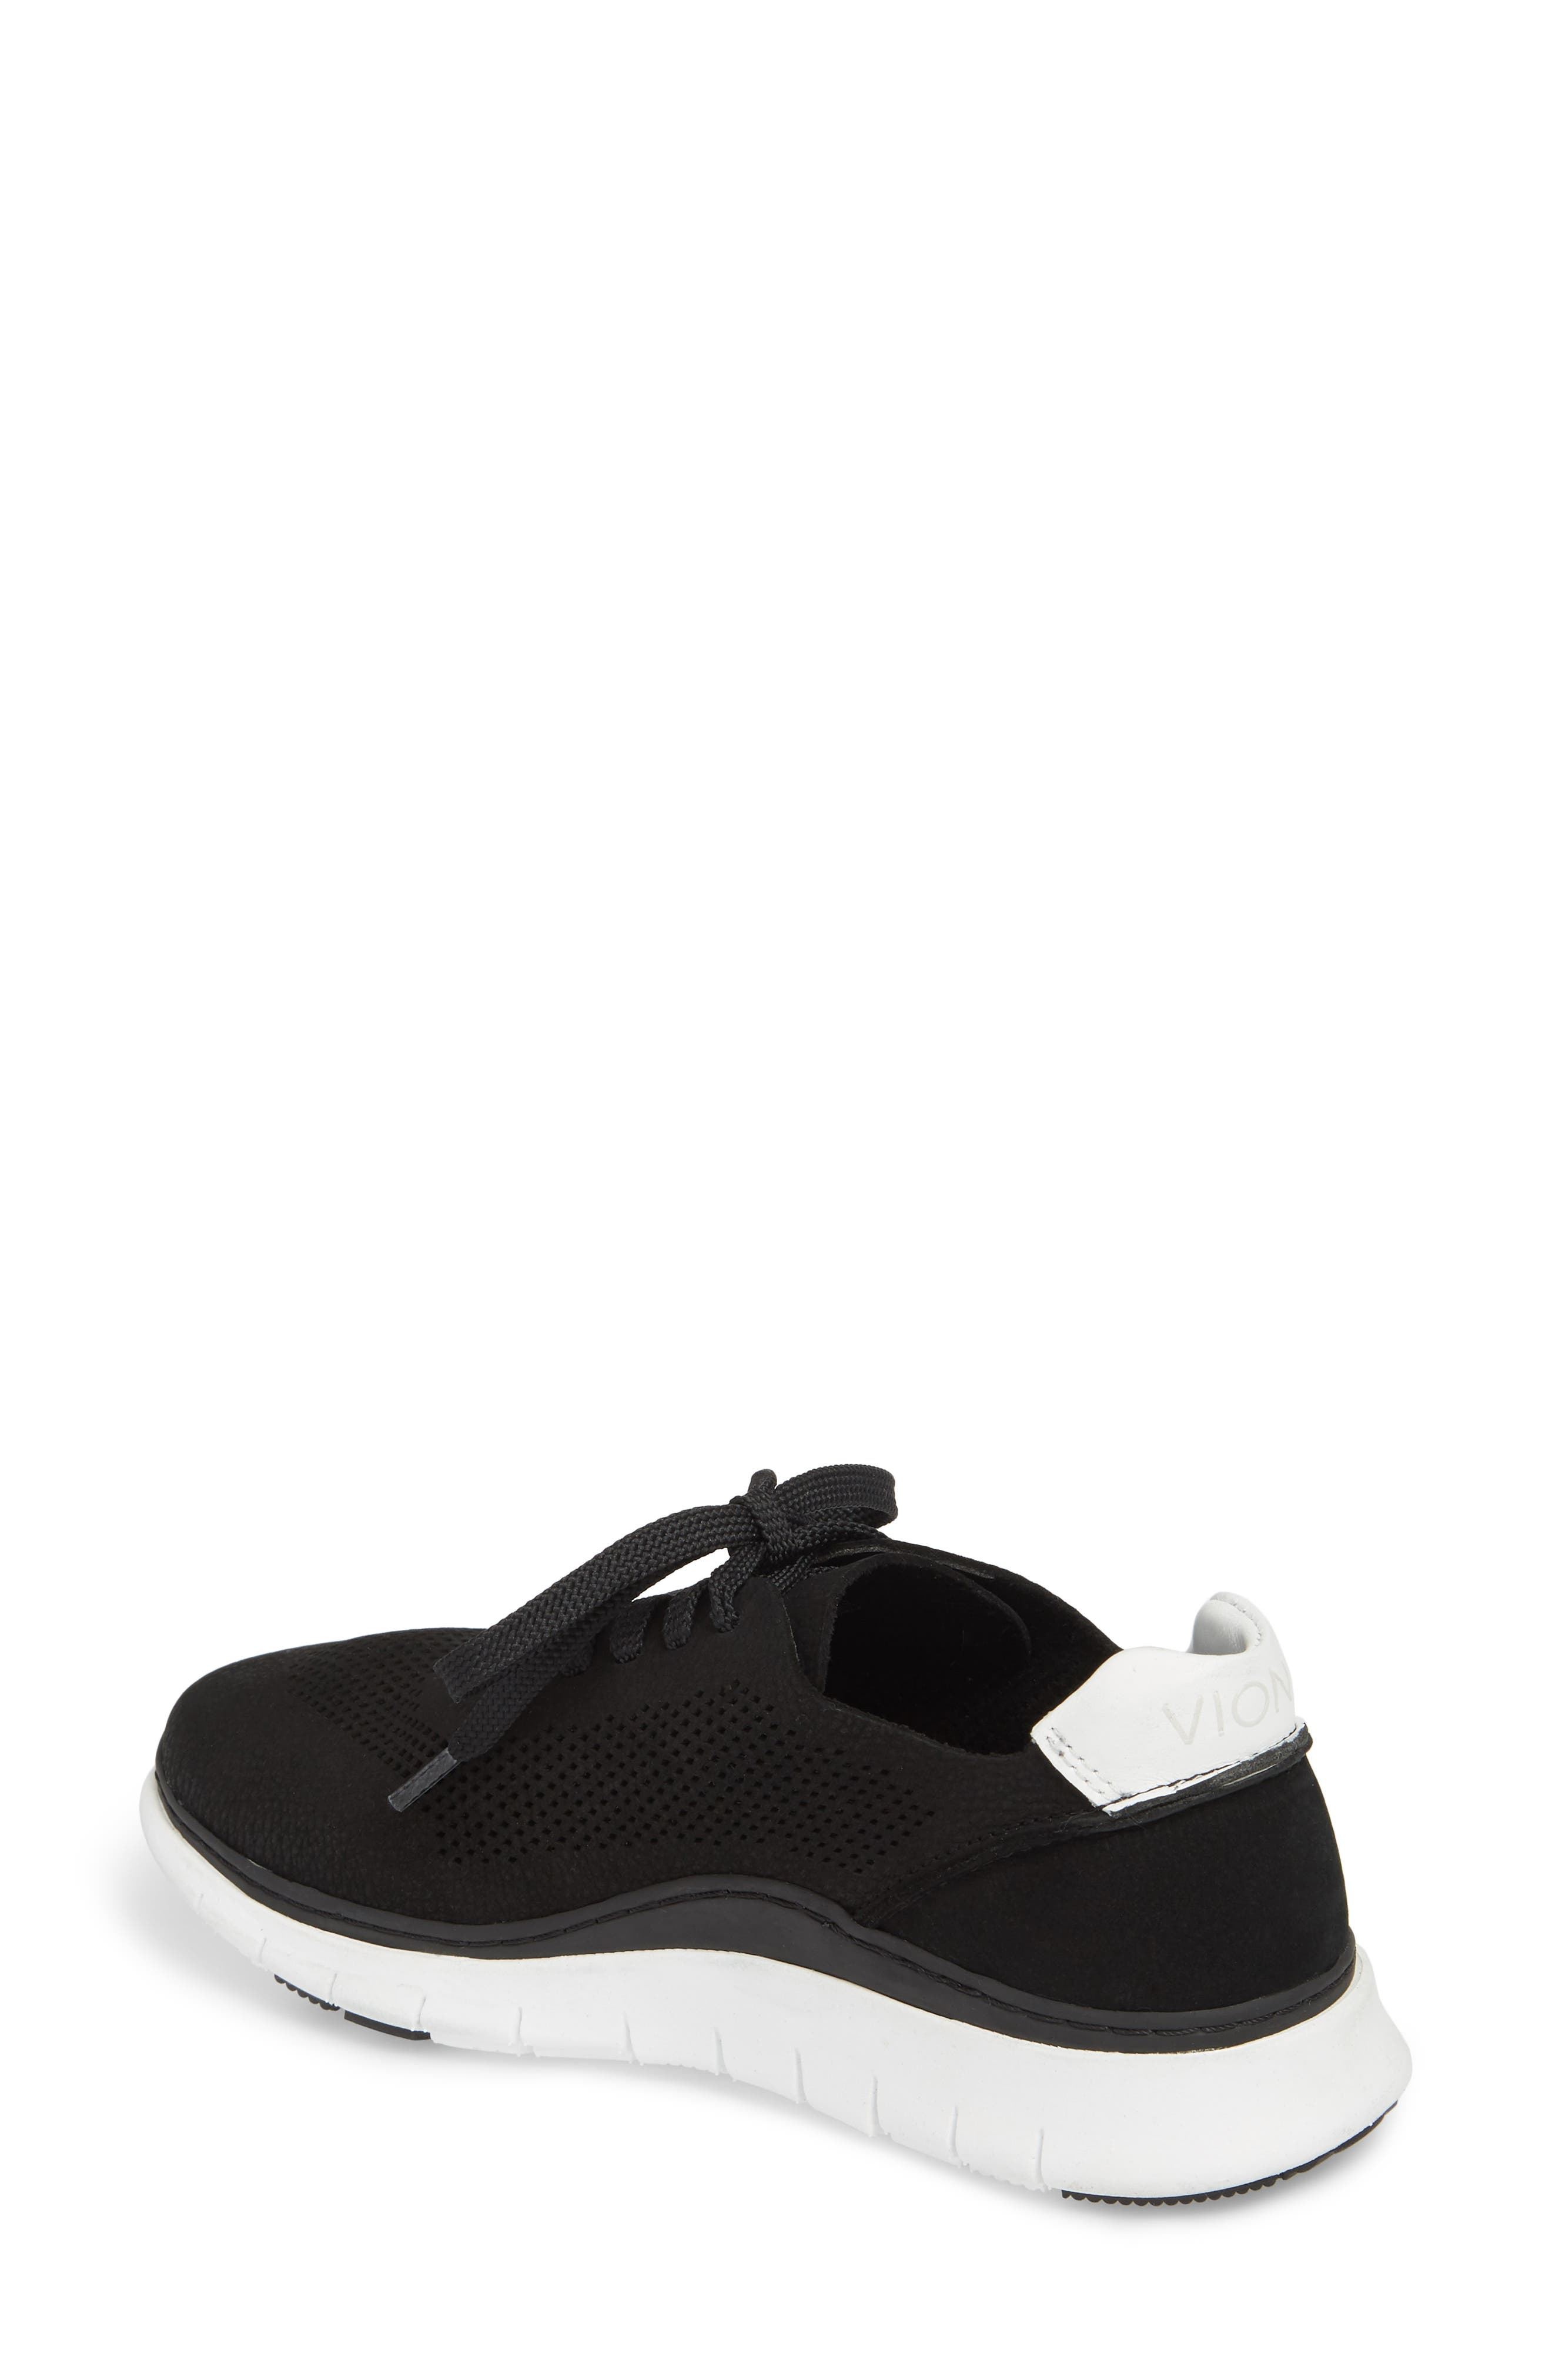 Joey Sneaker,                             Alternate thumbnail 2, color,                             BLACK NUBUCK LEATHER